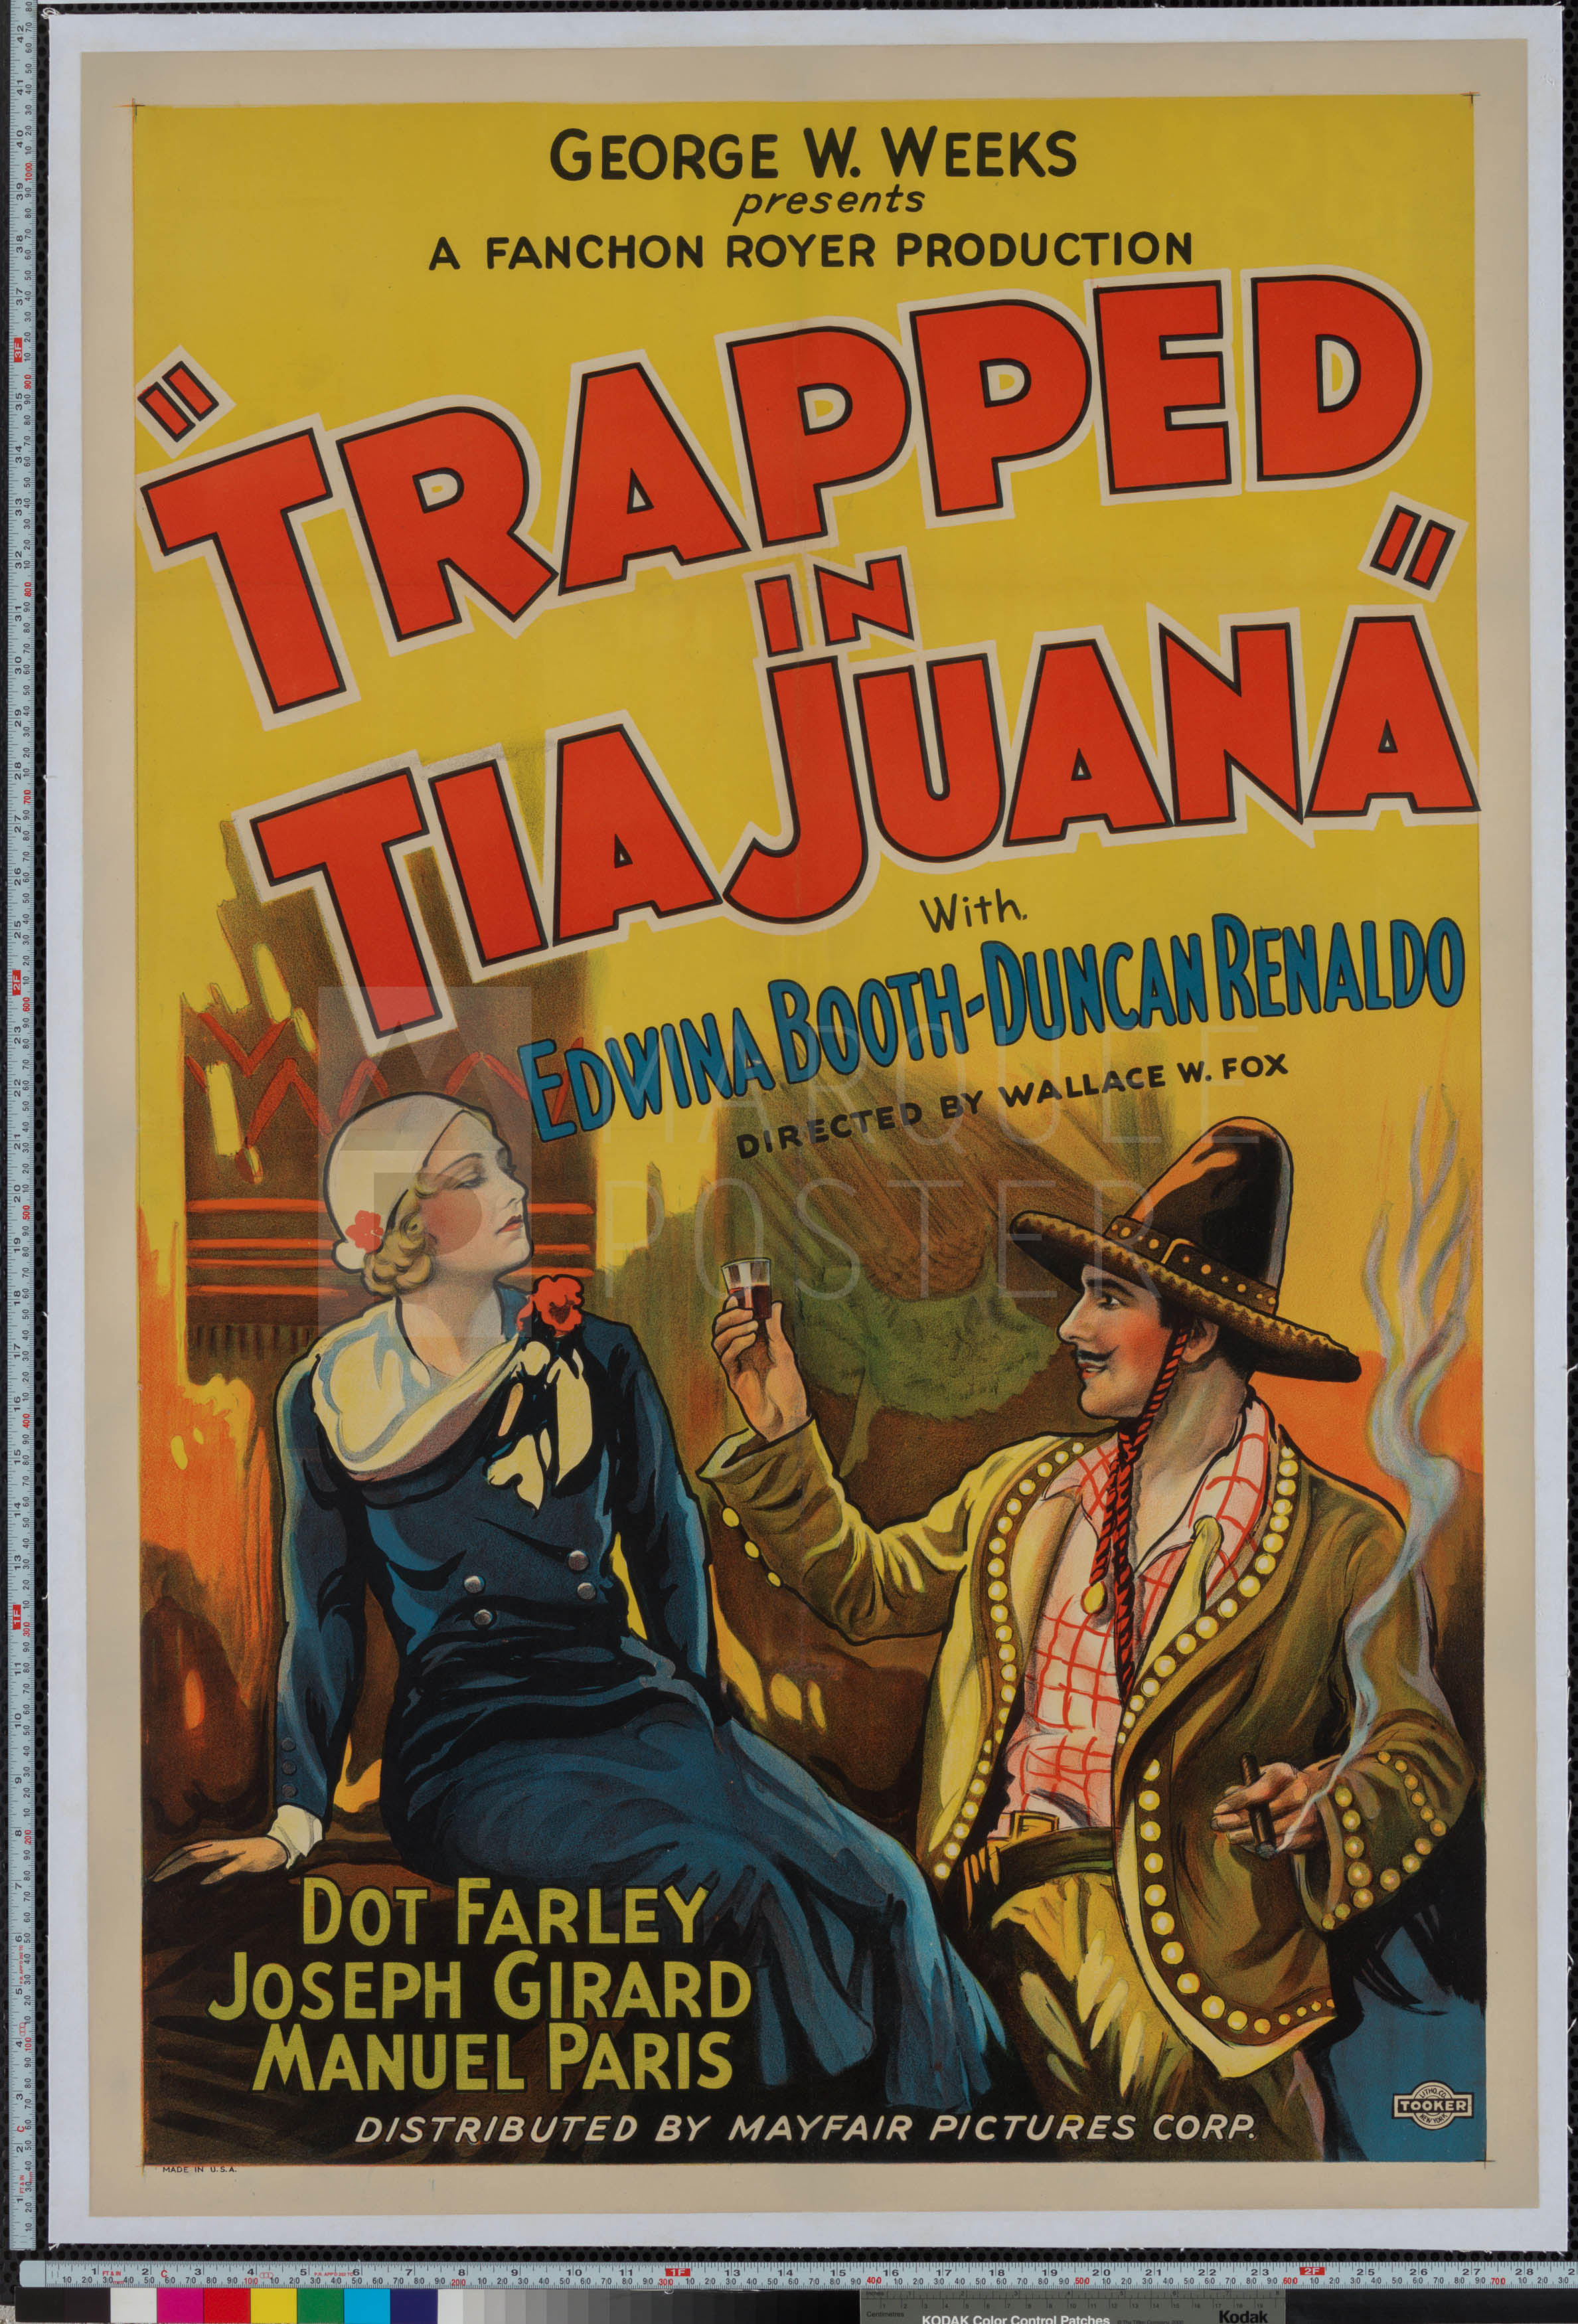 44-trapped-in-tia-juana-us-1-sheet-1932-02